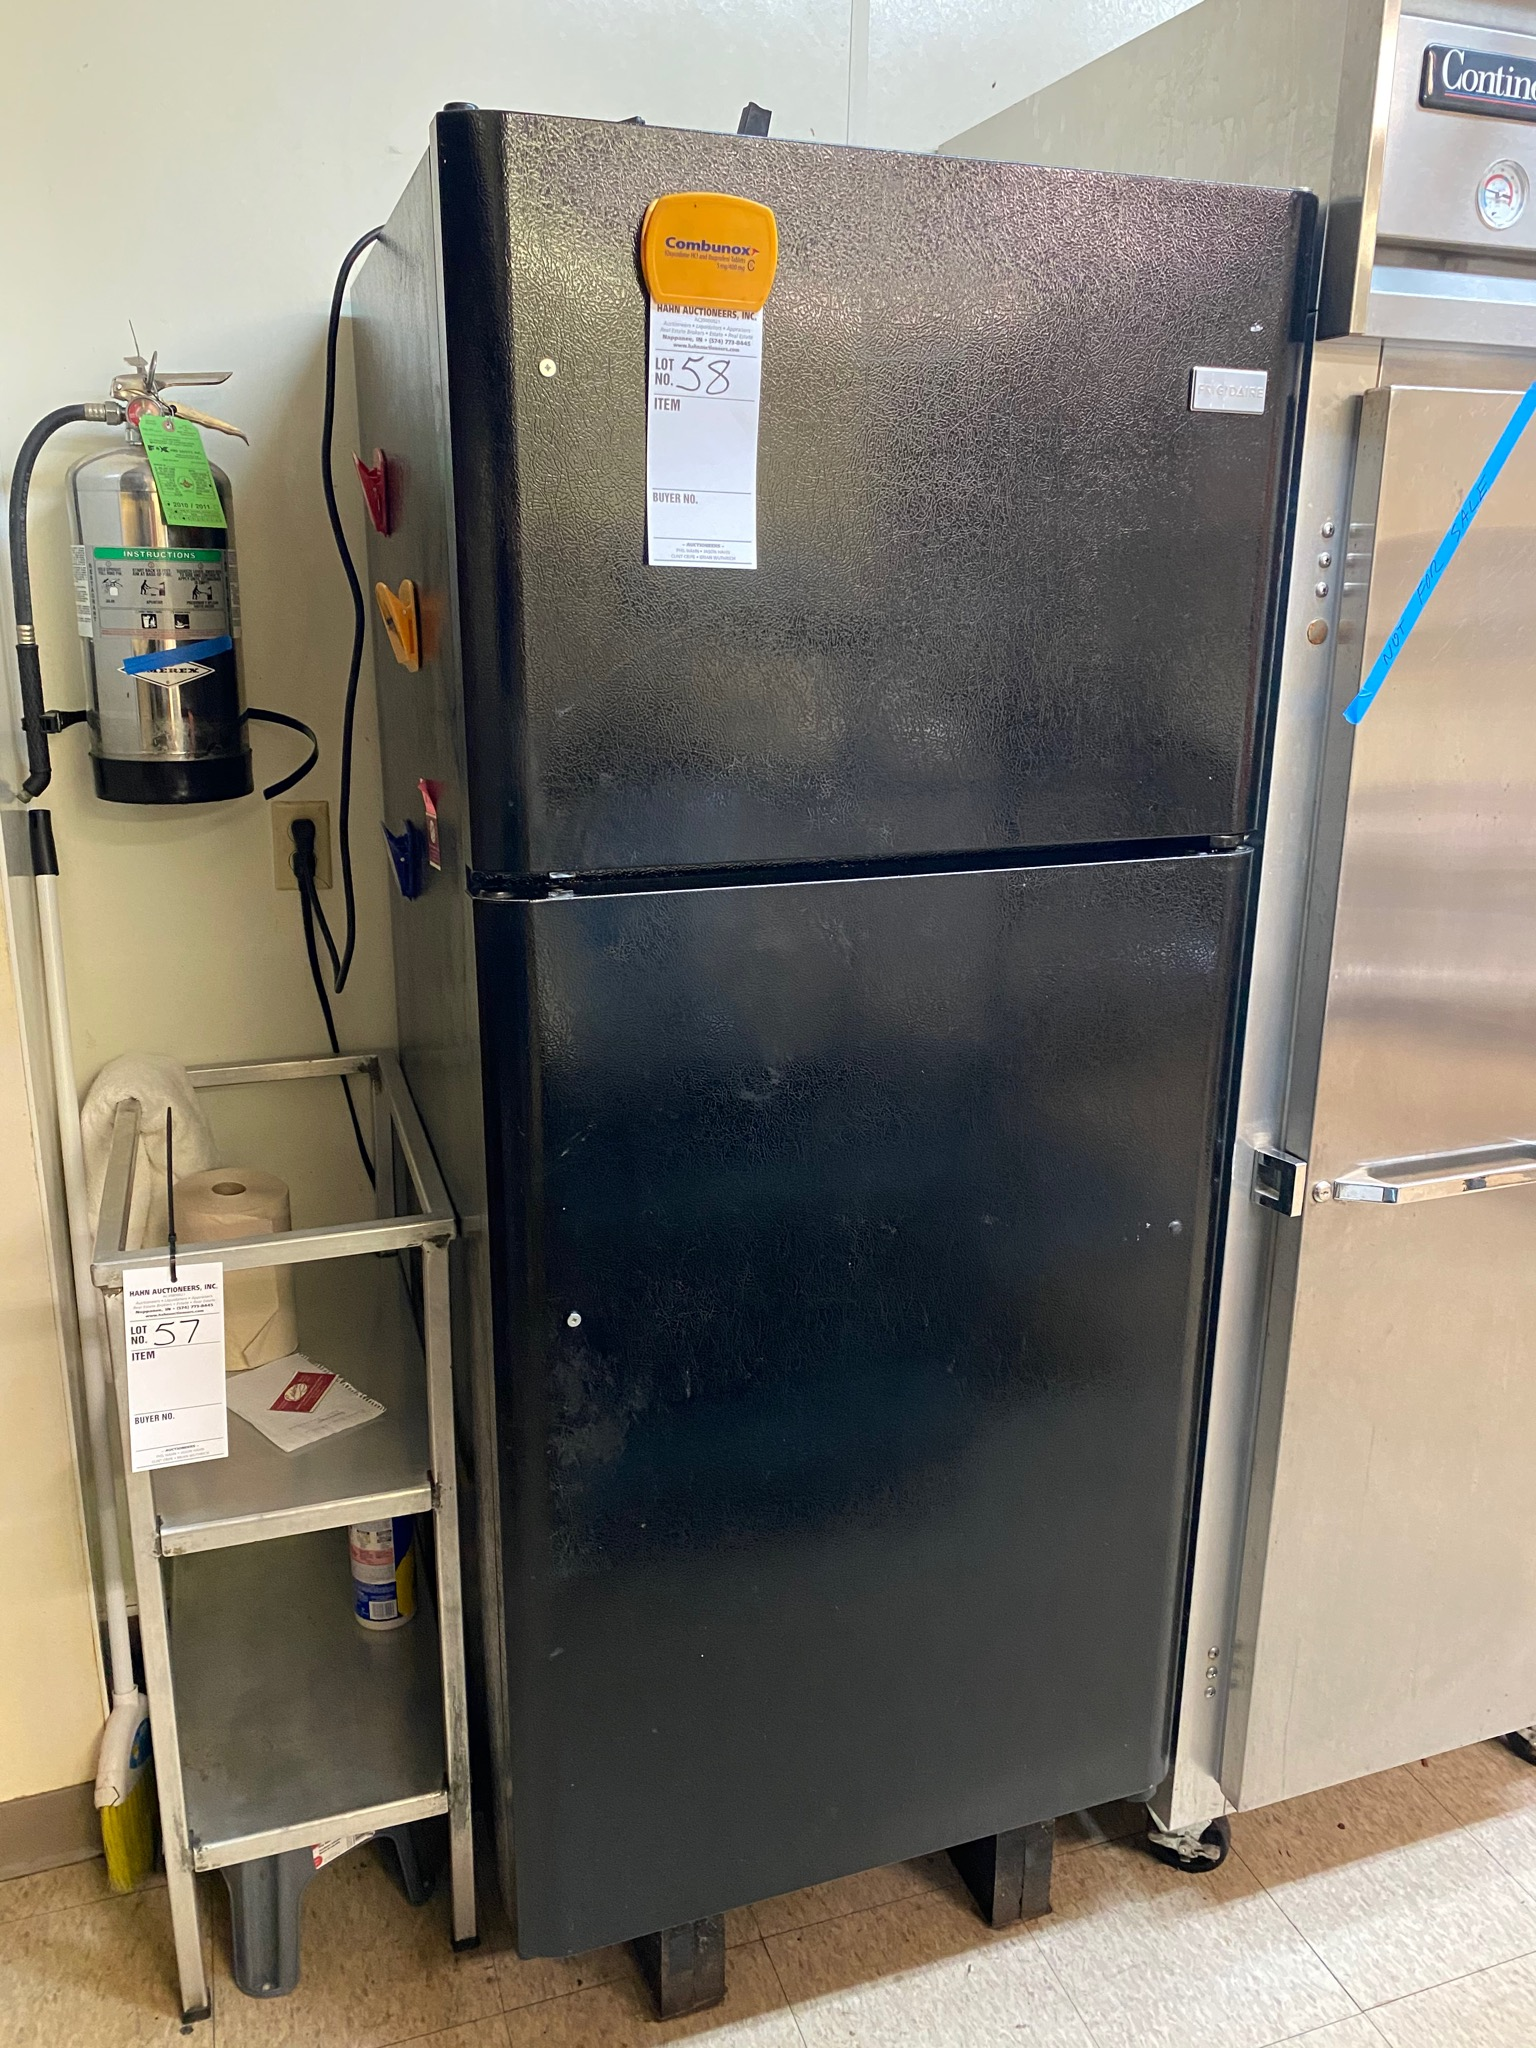 Frigidaire black textured 24.4 CF double dr. refrigerator freezer